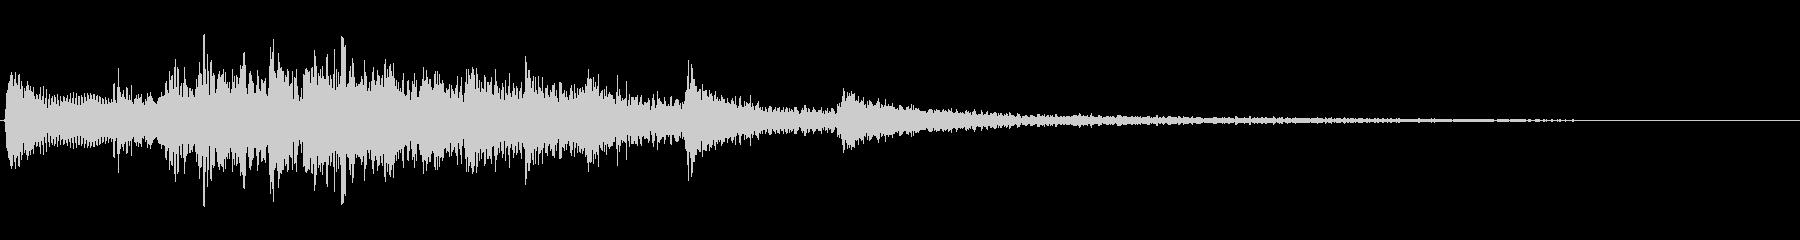 KANTギター高音穏やかジングル7の未再生の波形